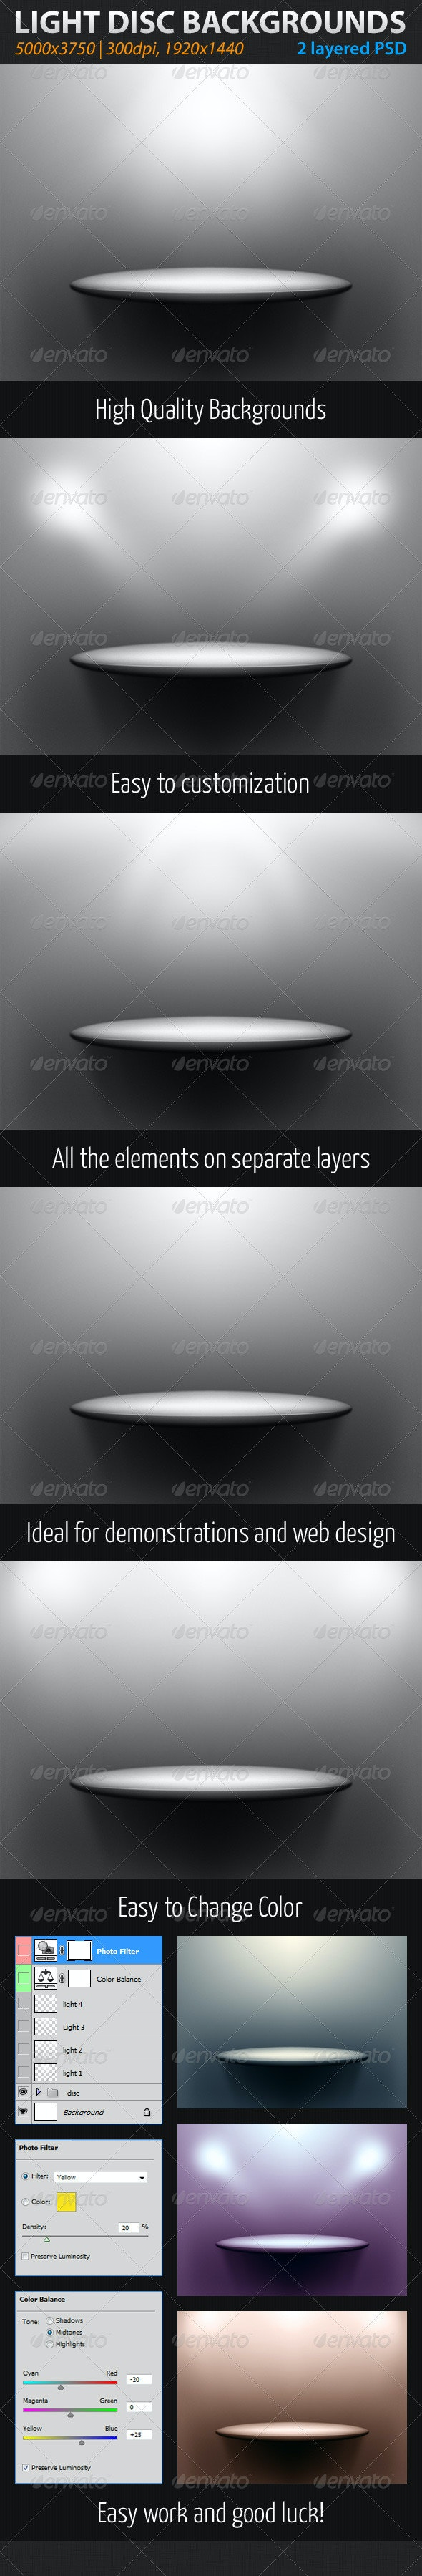 Light Disc Backgrounds - Tech / Futuristic Backgrounds